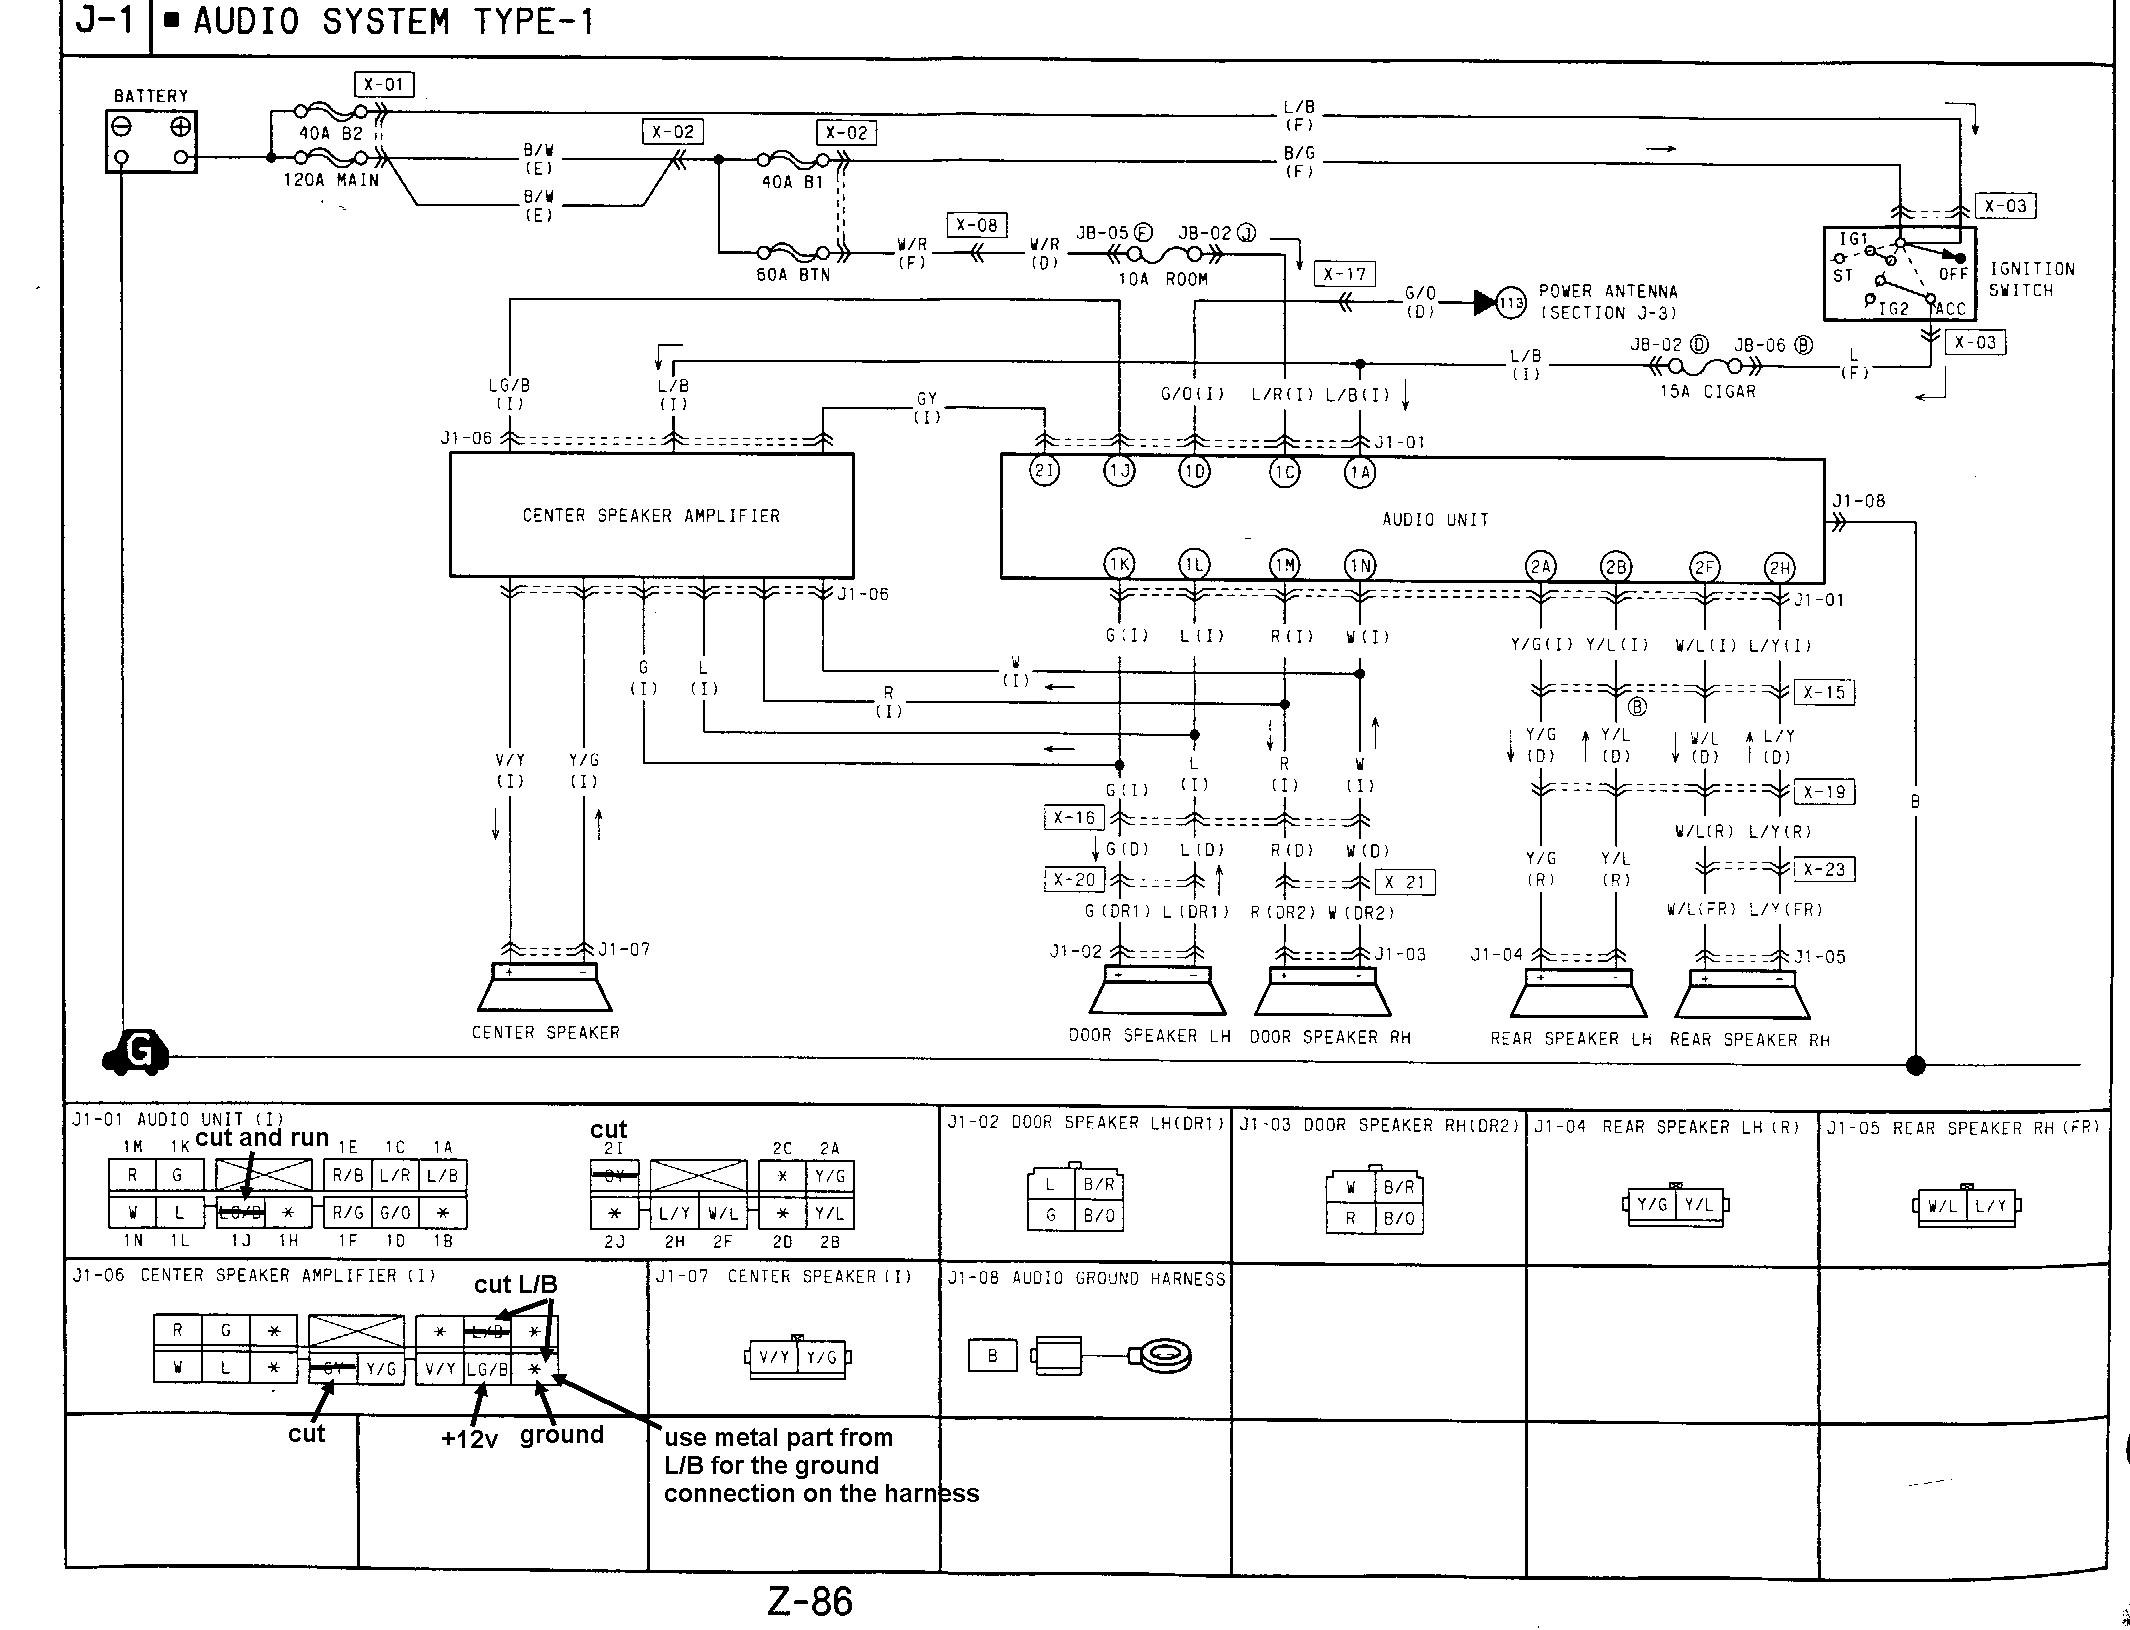 jeep jl wiring diagram kitchenaid superba refrigerator wj harness diy enthusiasts diagrams tweeter